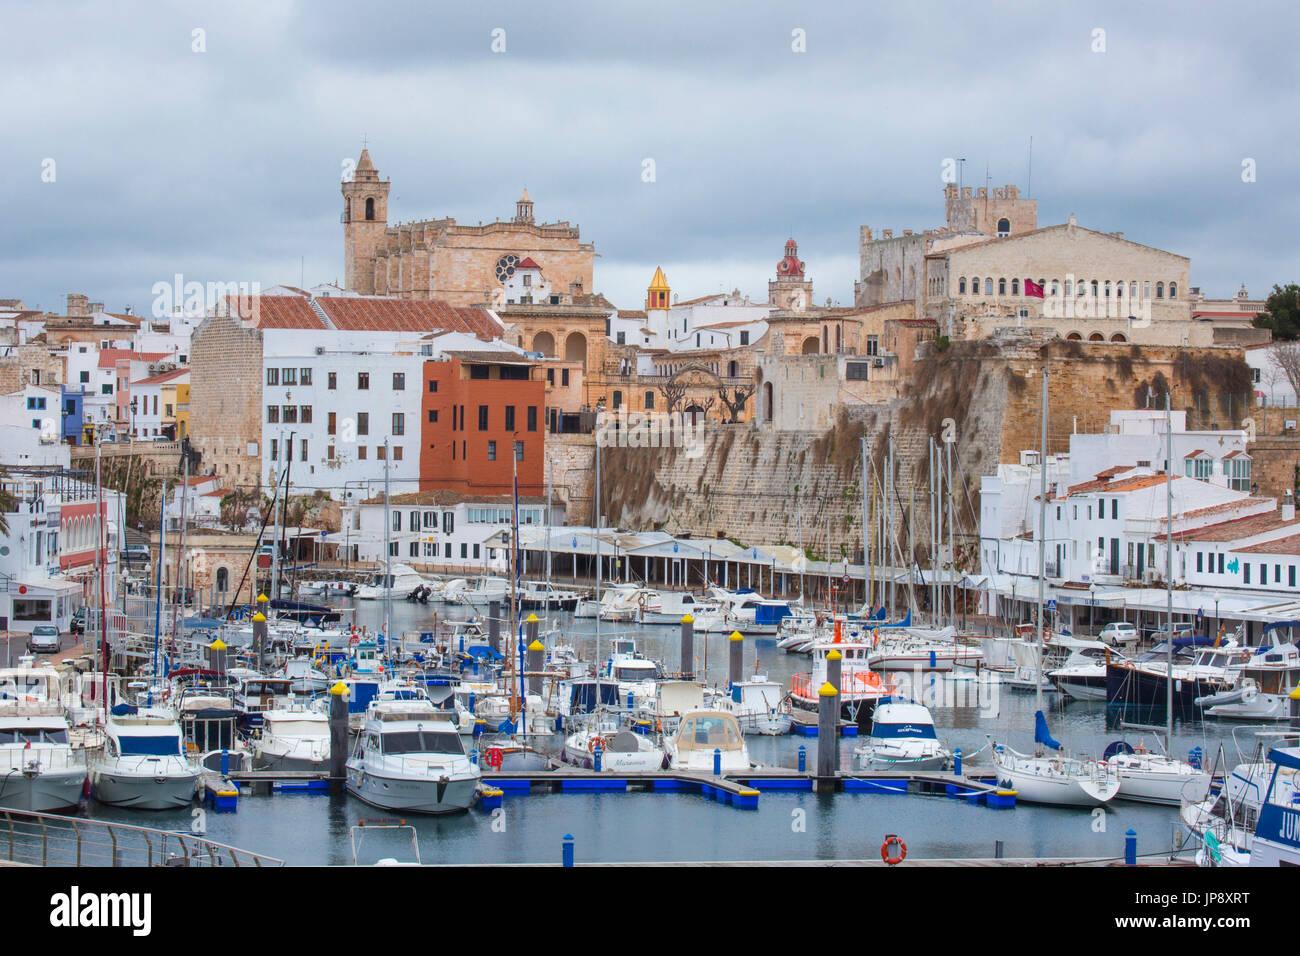 Spain balearic Islands, Menorca Island, Ciutadella City - Stock Image